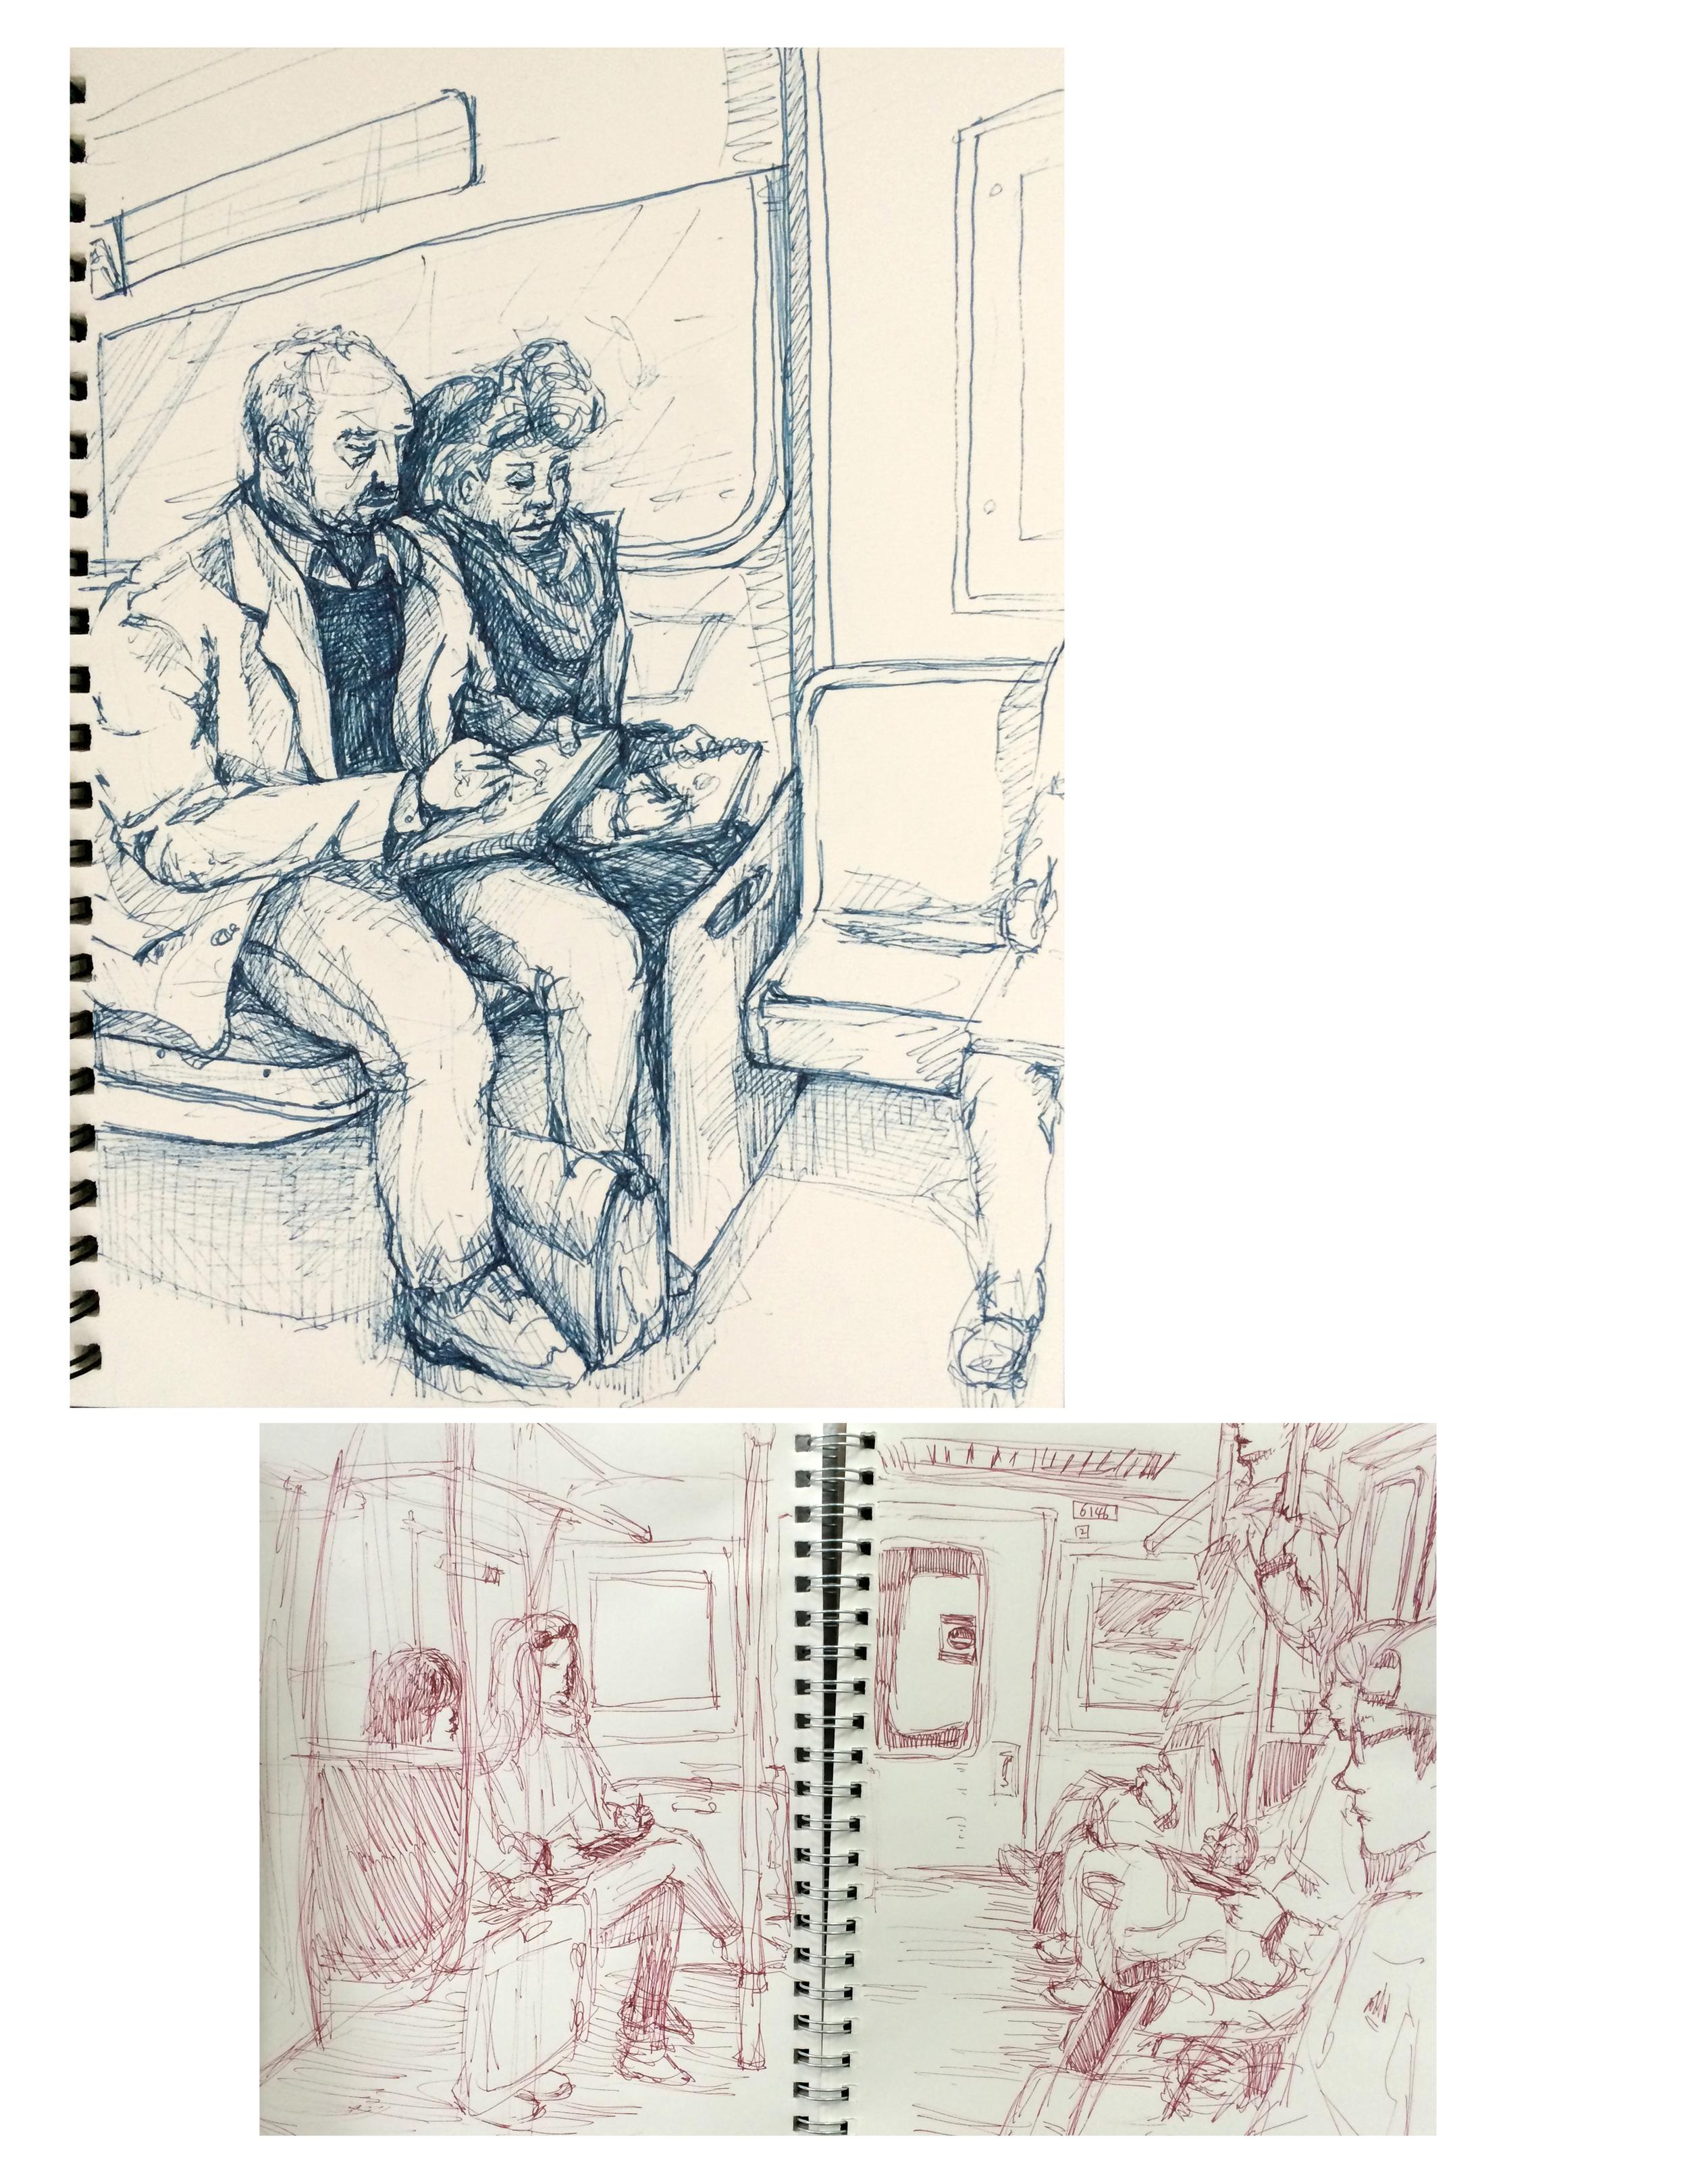 72-sketchsub.jpg